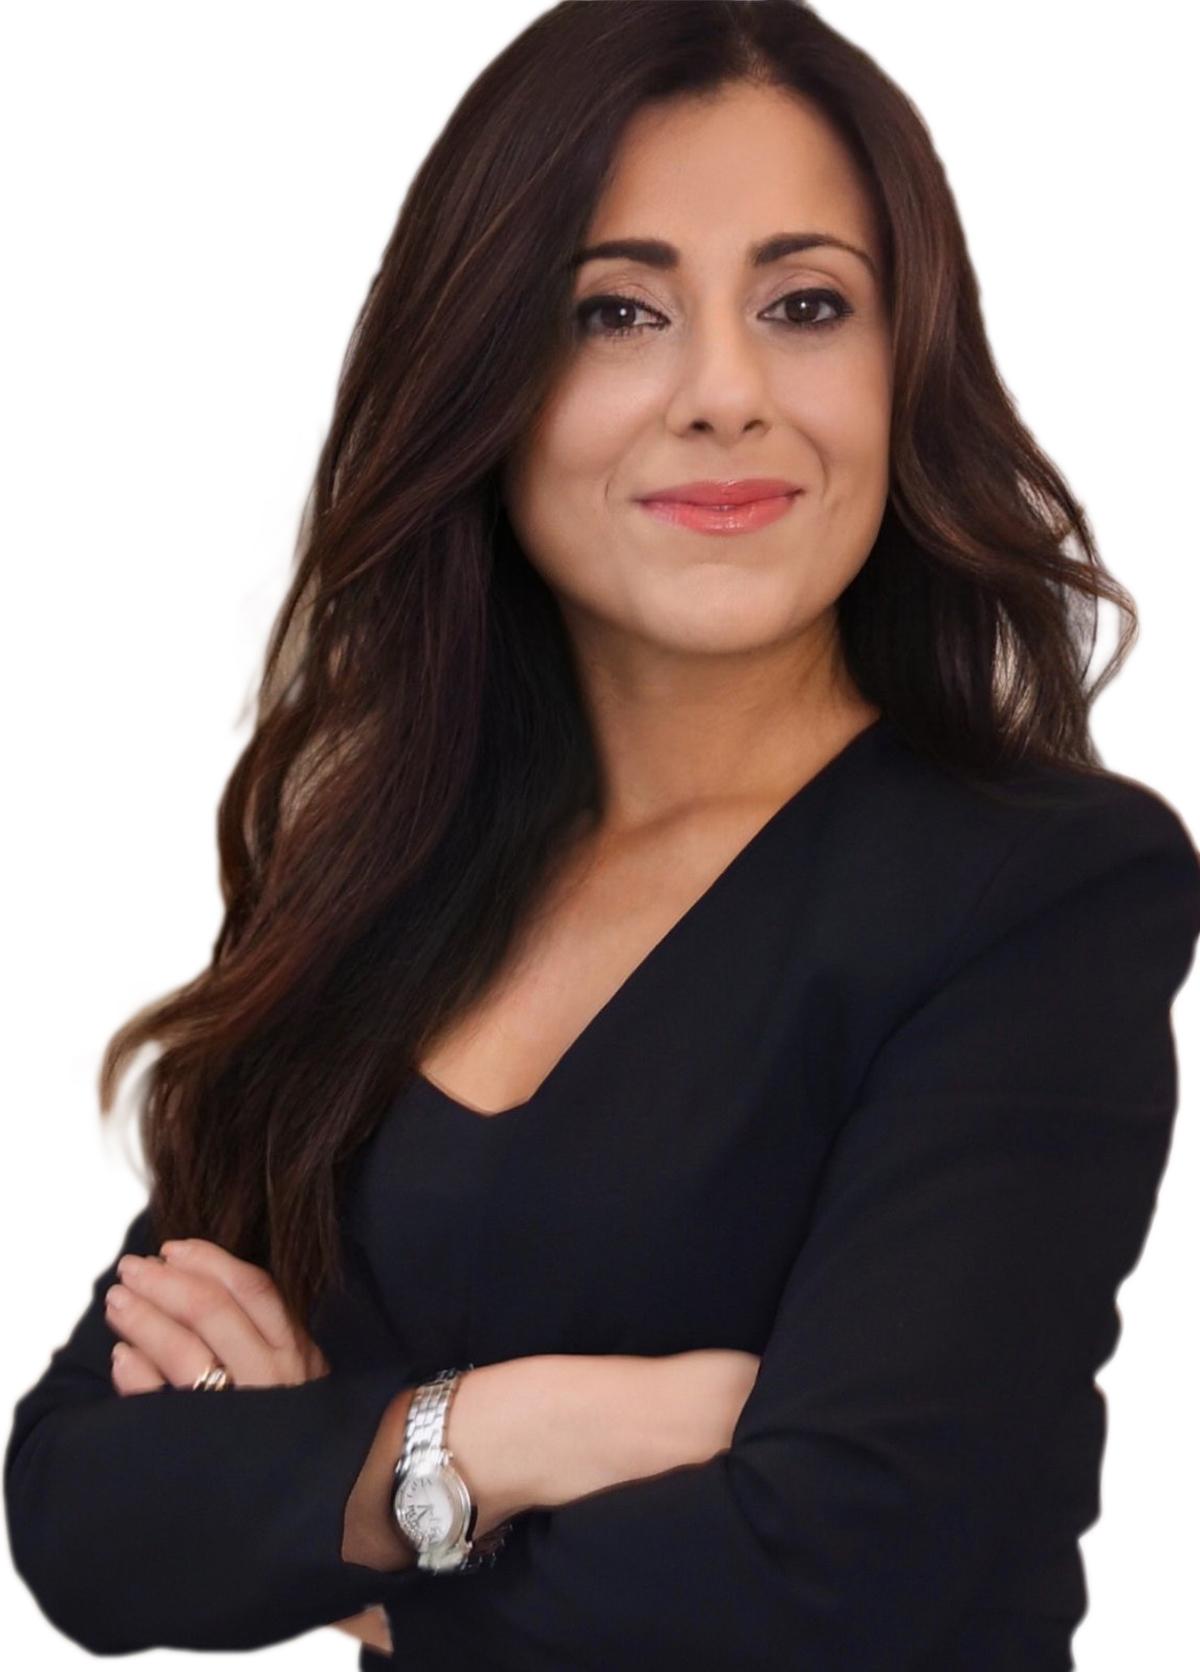 Manuela Travaglini